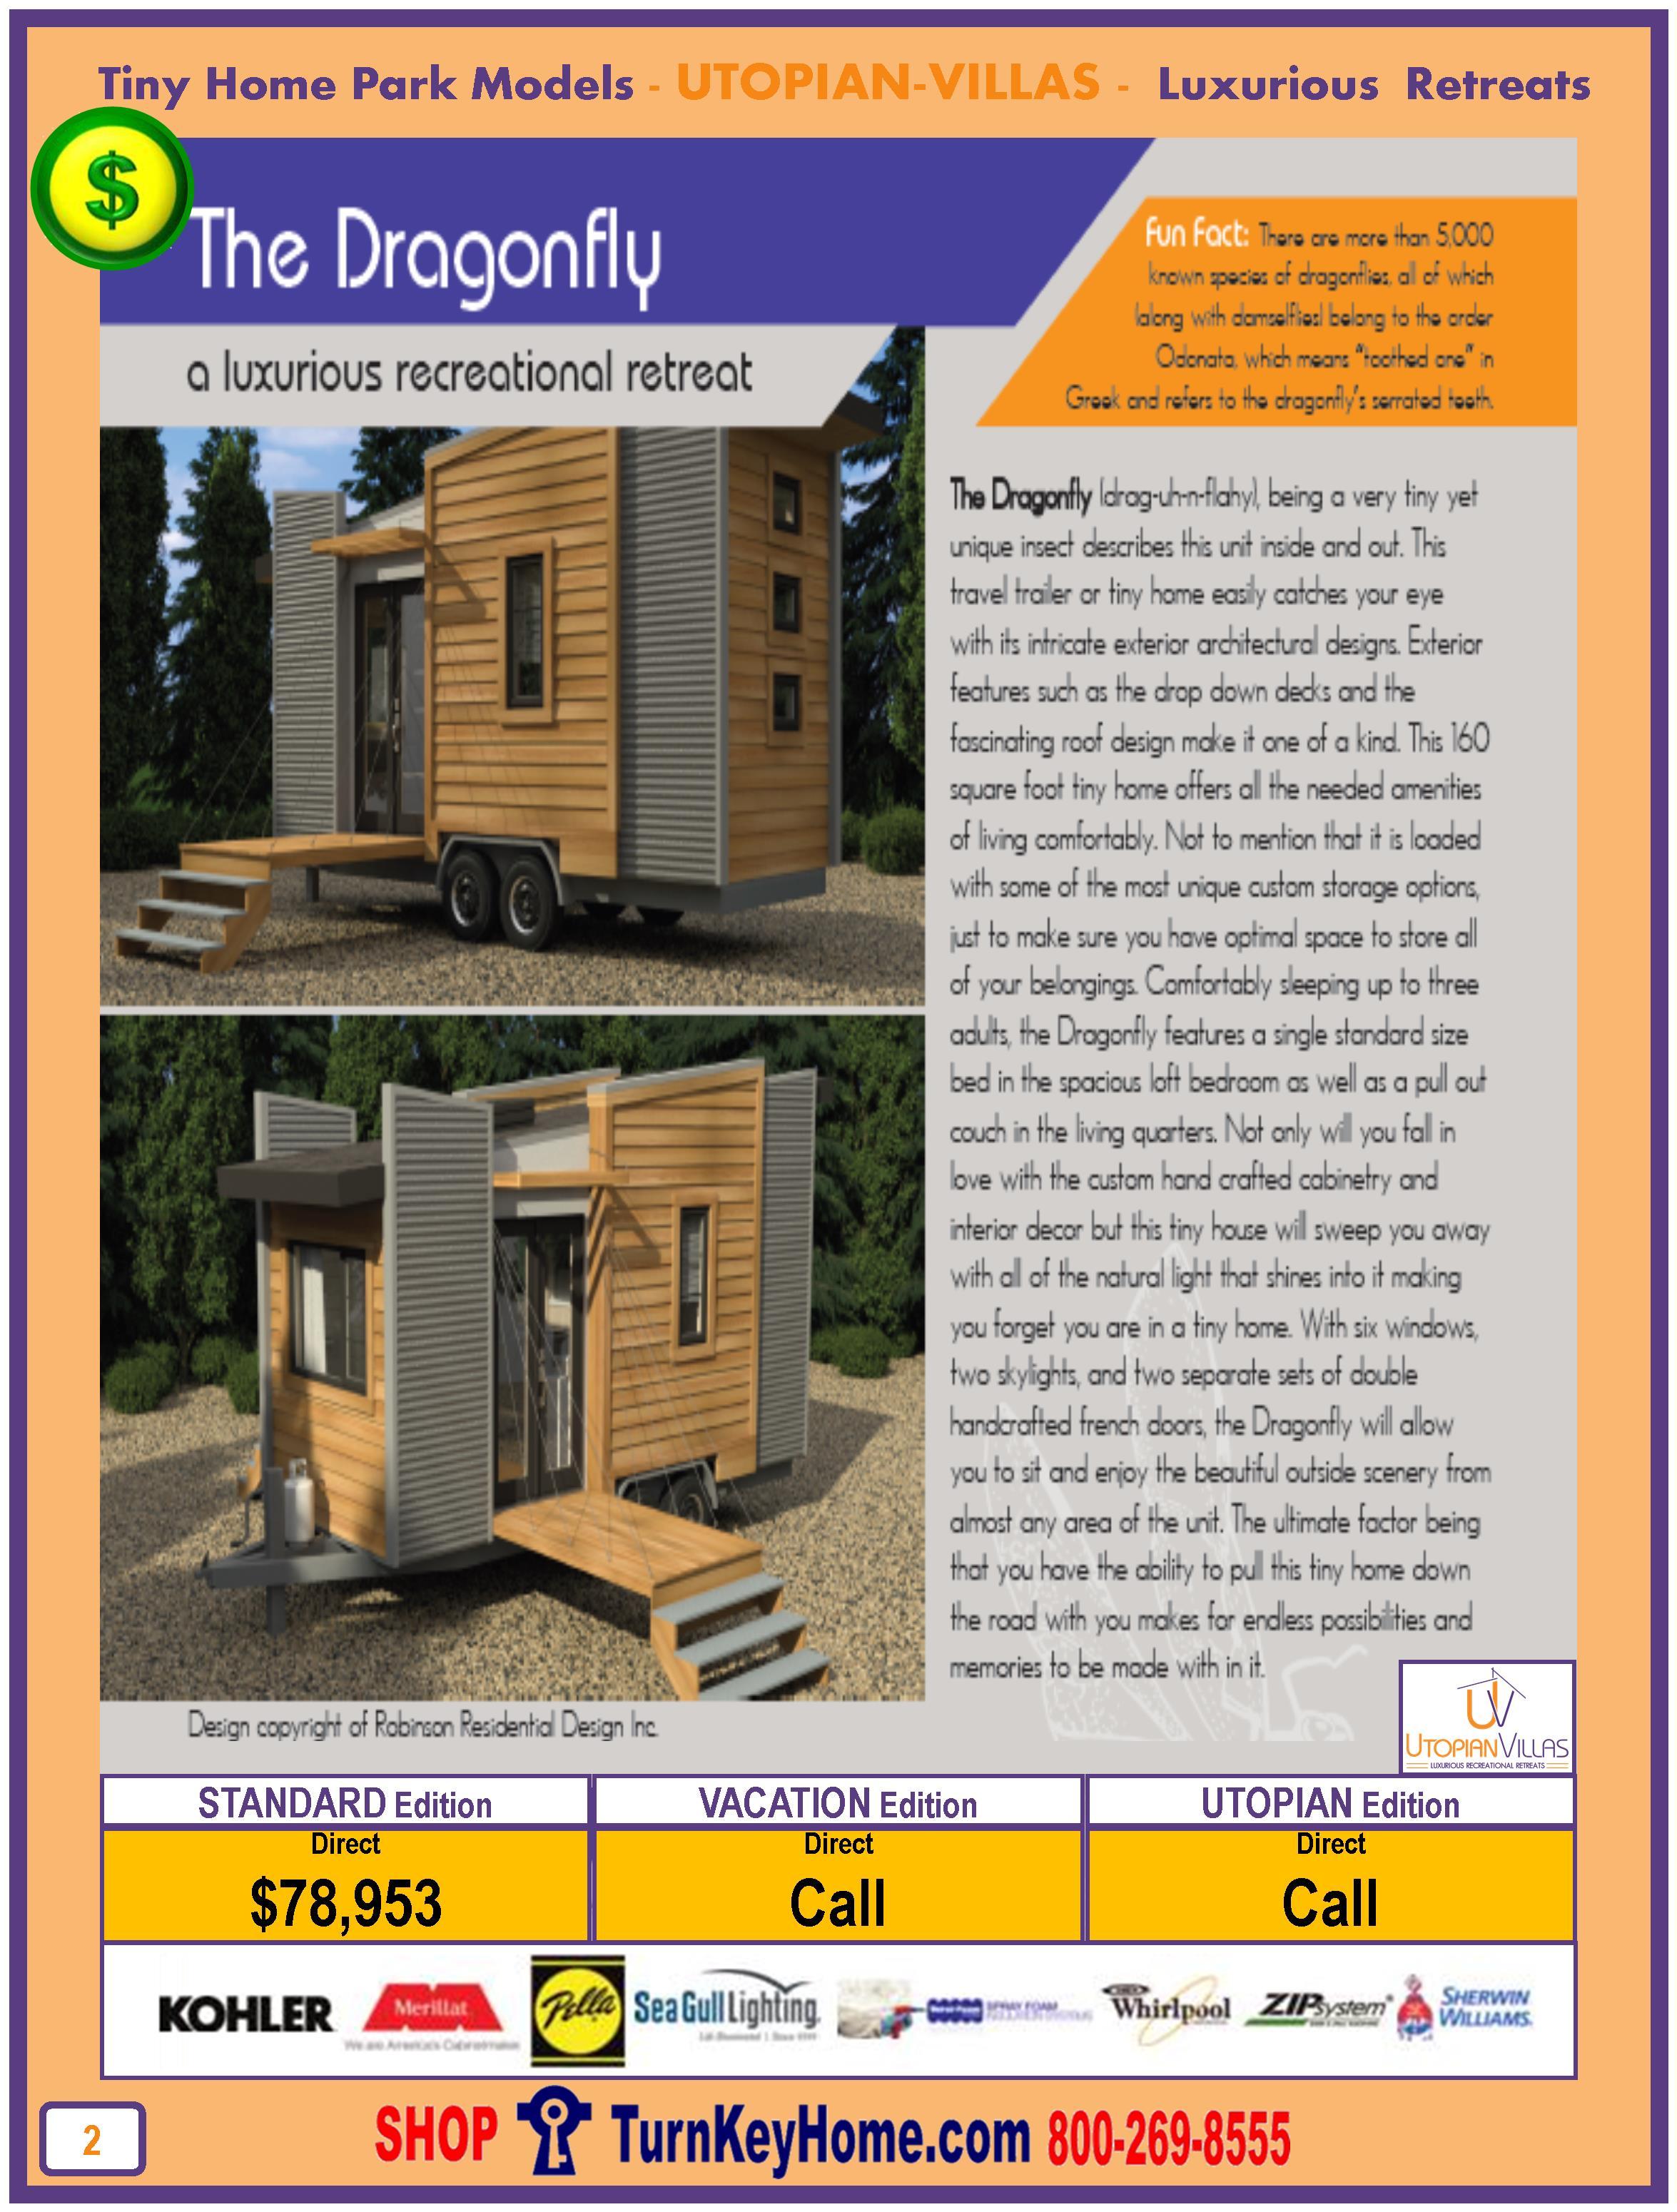 Tiny.Home.Park.Model.Utopian.Villas.DRAGONFLY.Plan.Price.P2.0116